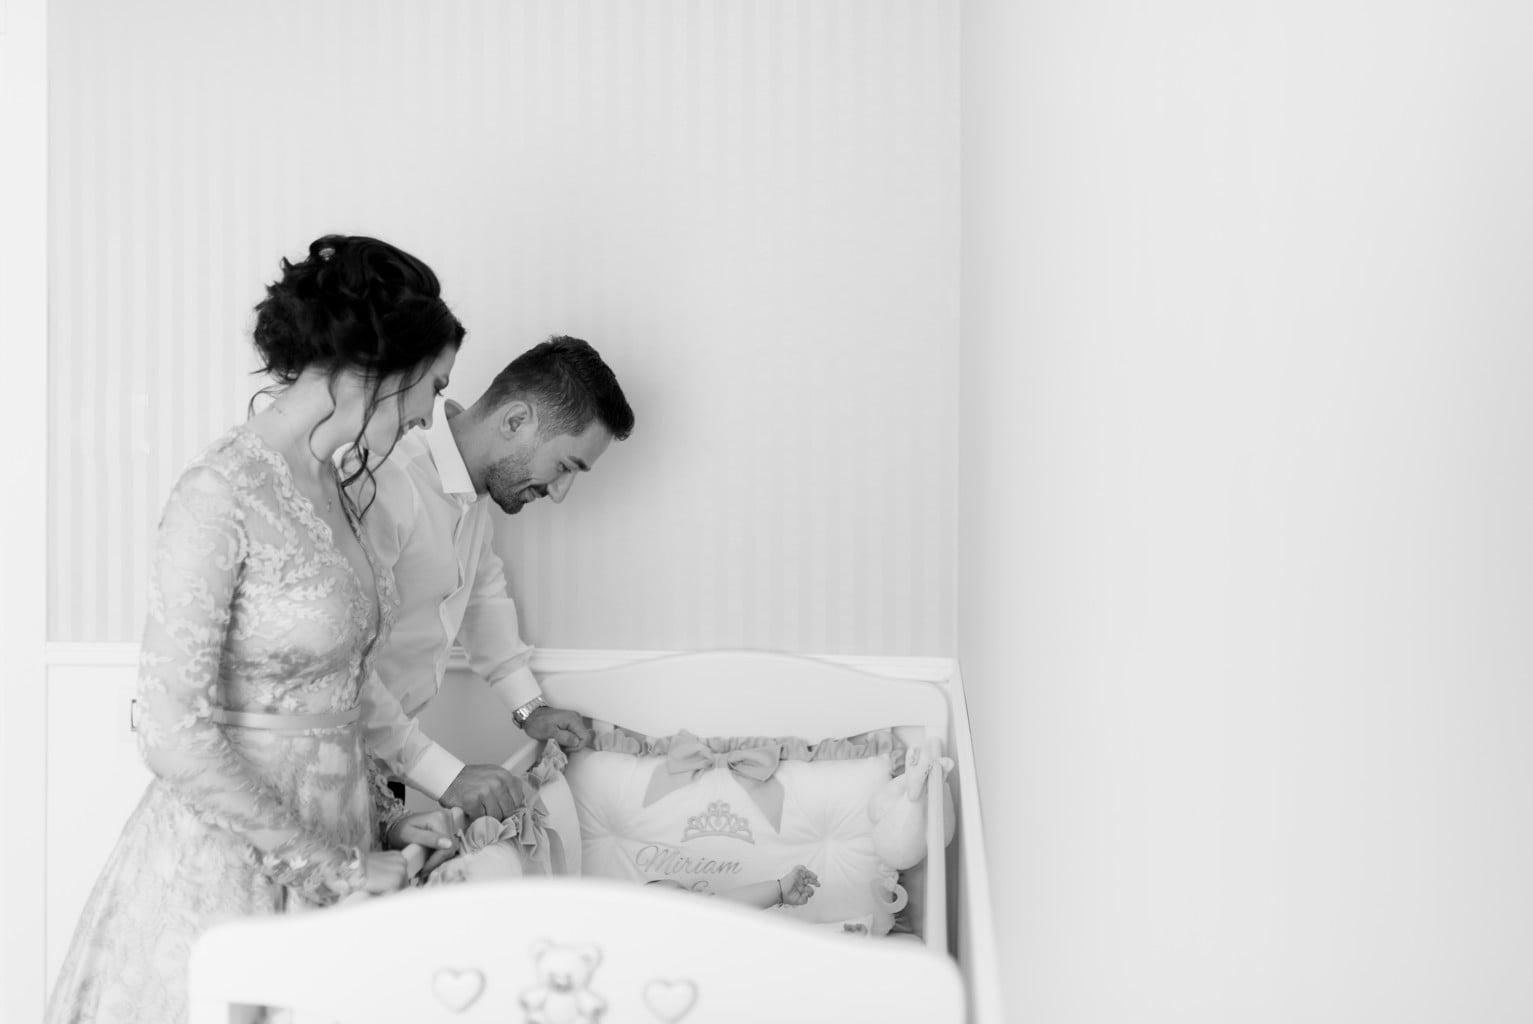 sedinta foto pregatiri bebelus botez